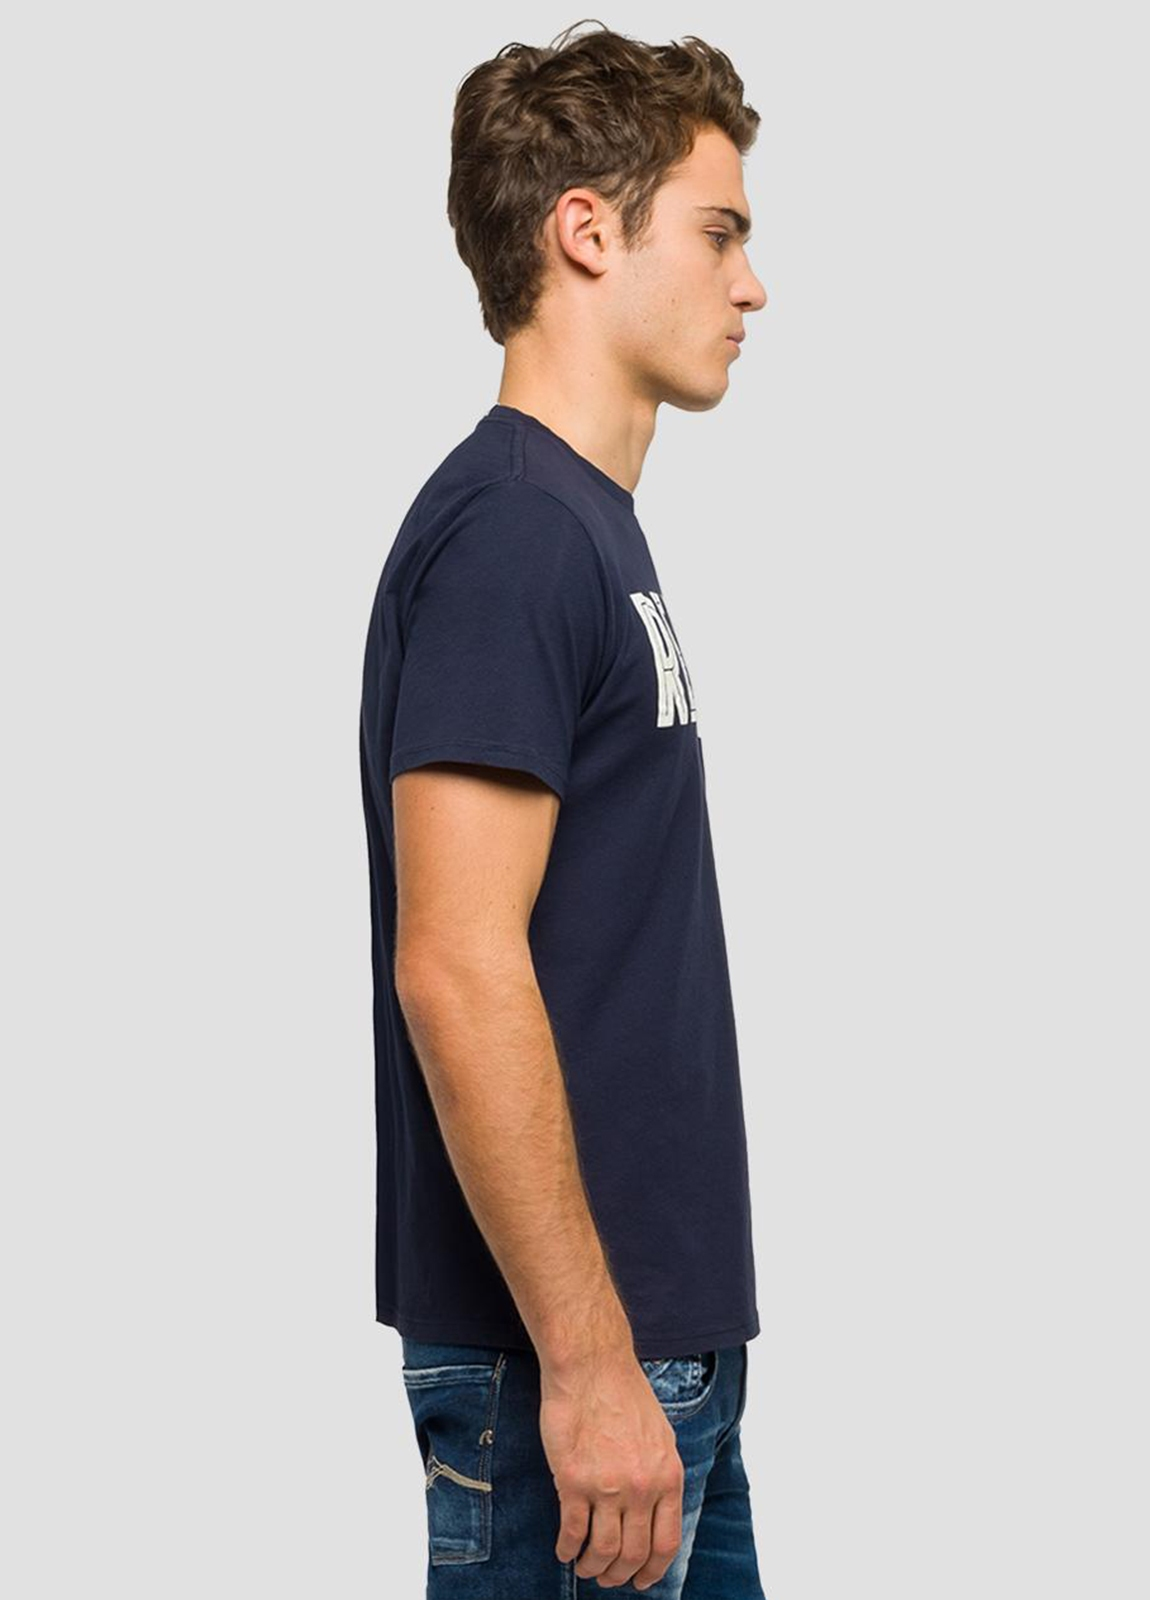 Camiseta manga corta color azul marino con estampado Replay. 100% Algodón. - Ítem1